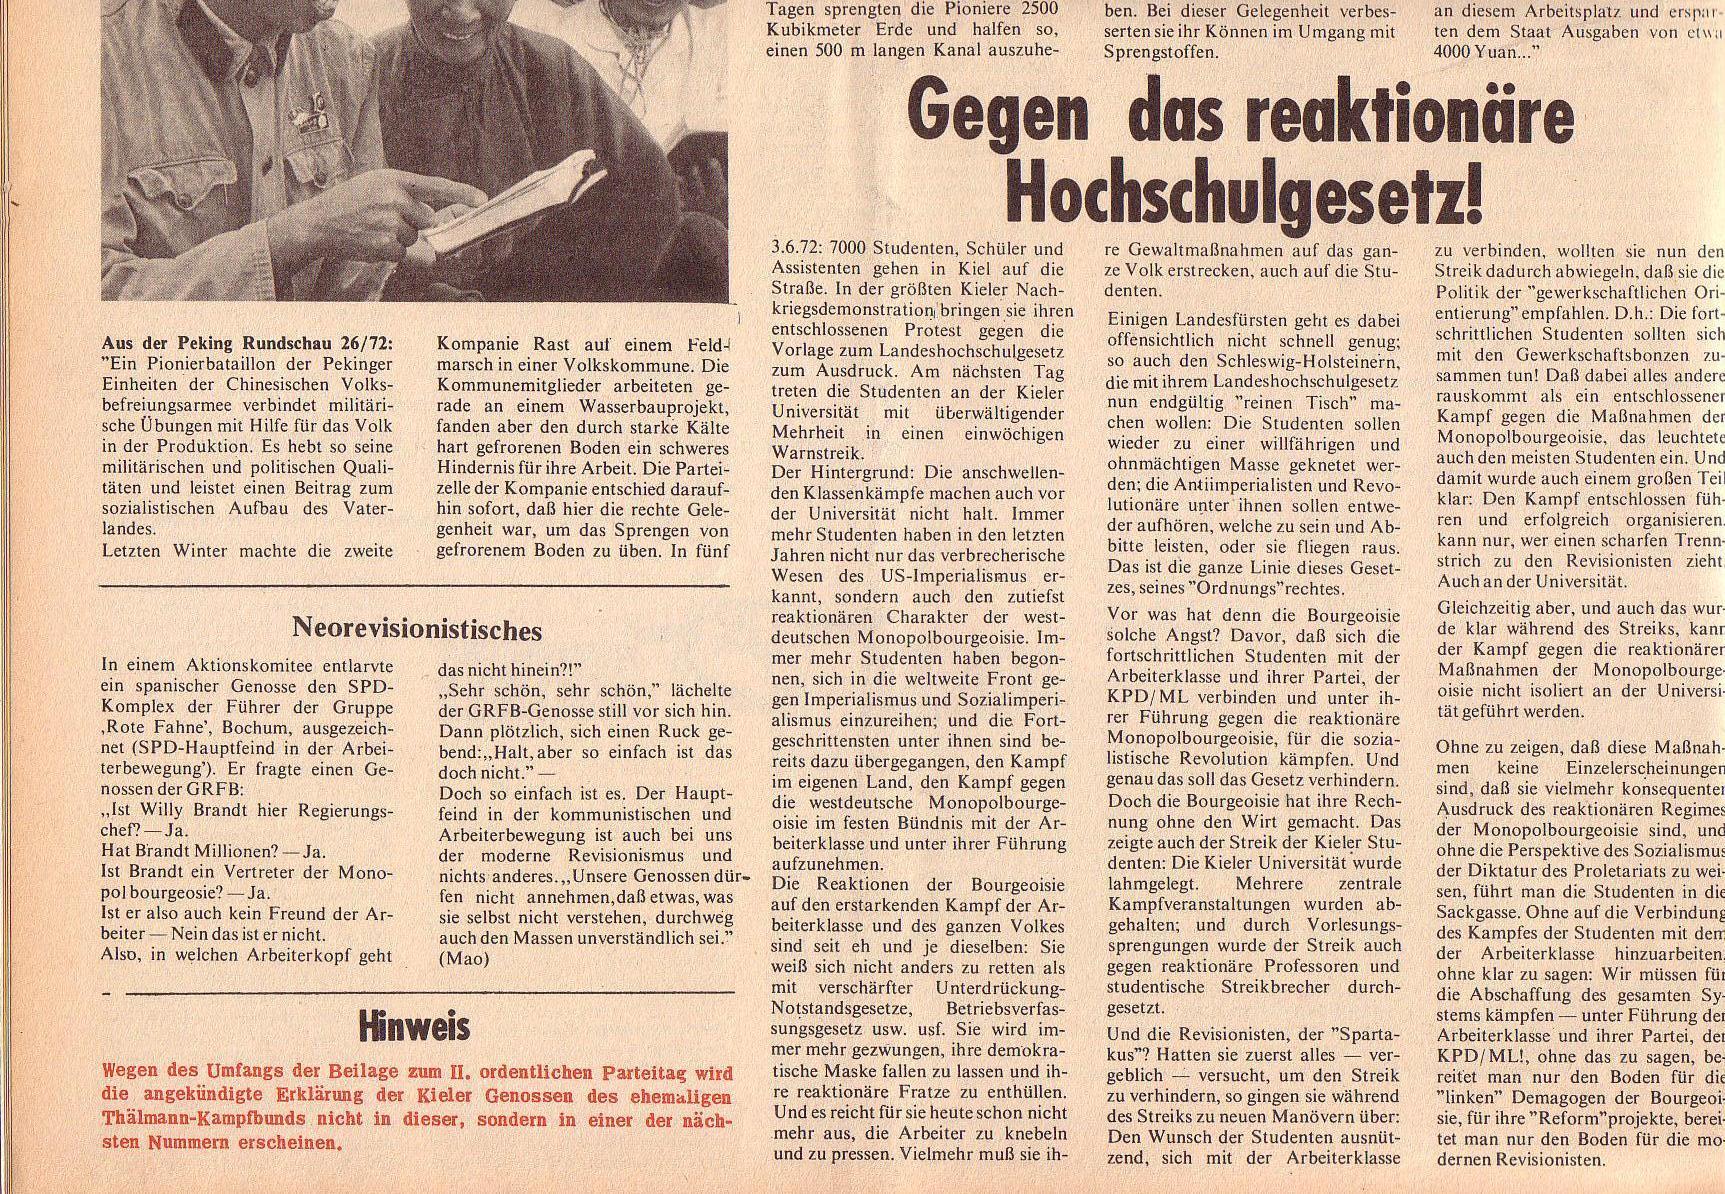 Roter Morgen, 6. Jg., 31. Juli 1972, Nr. 15, Seite 12b